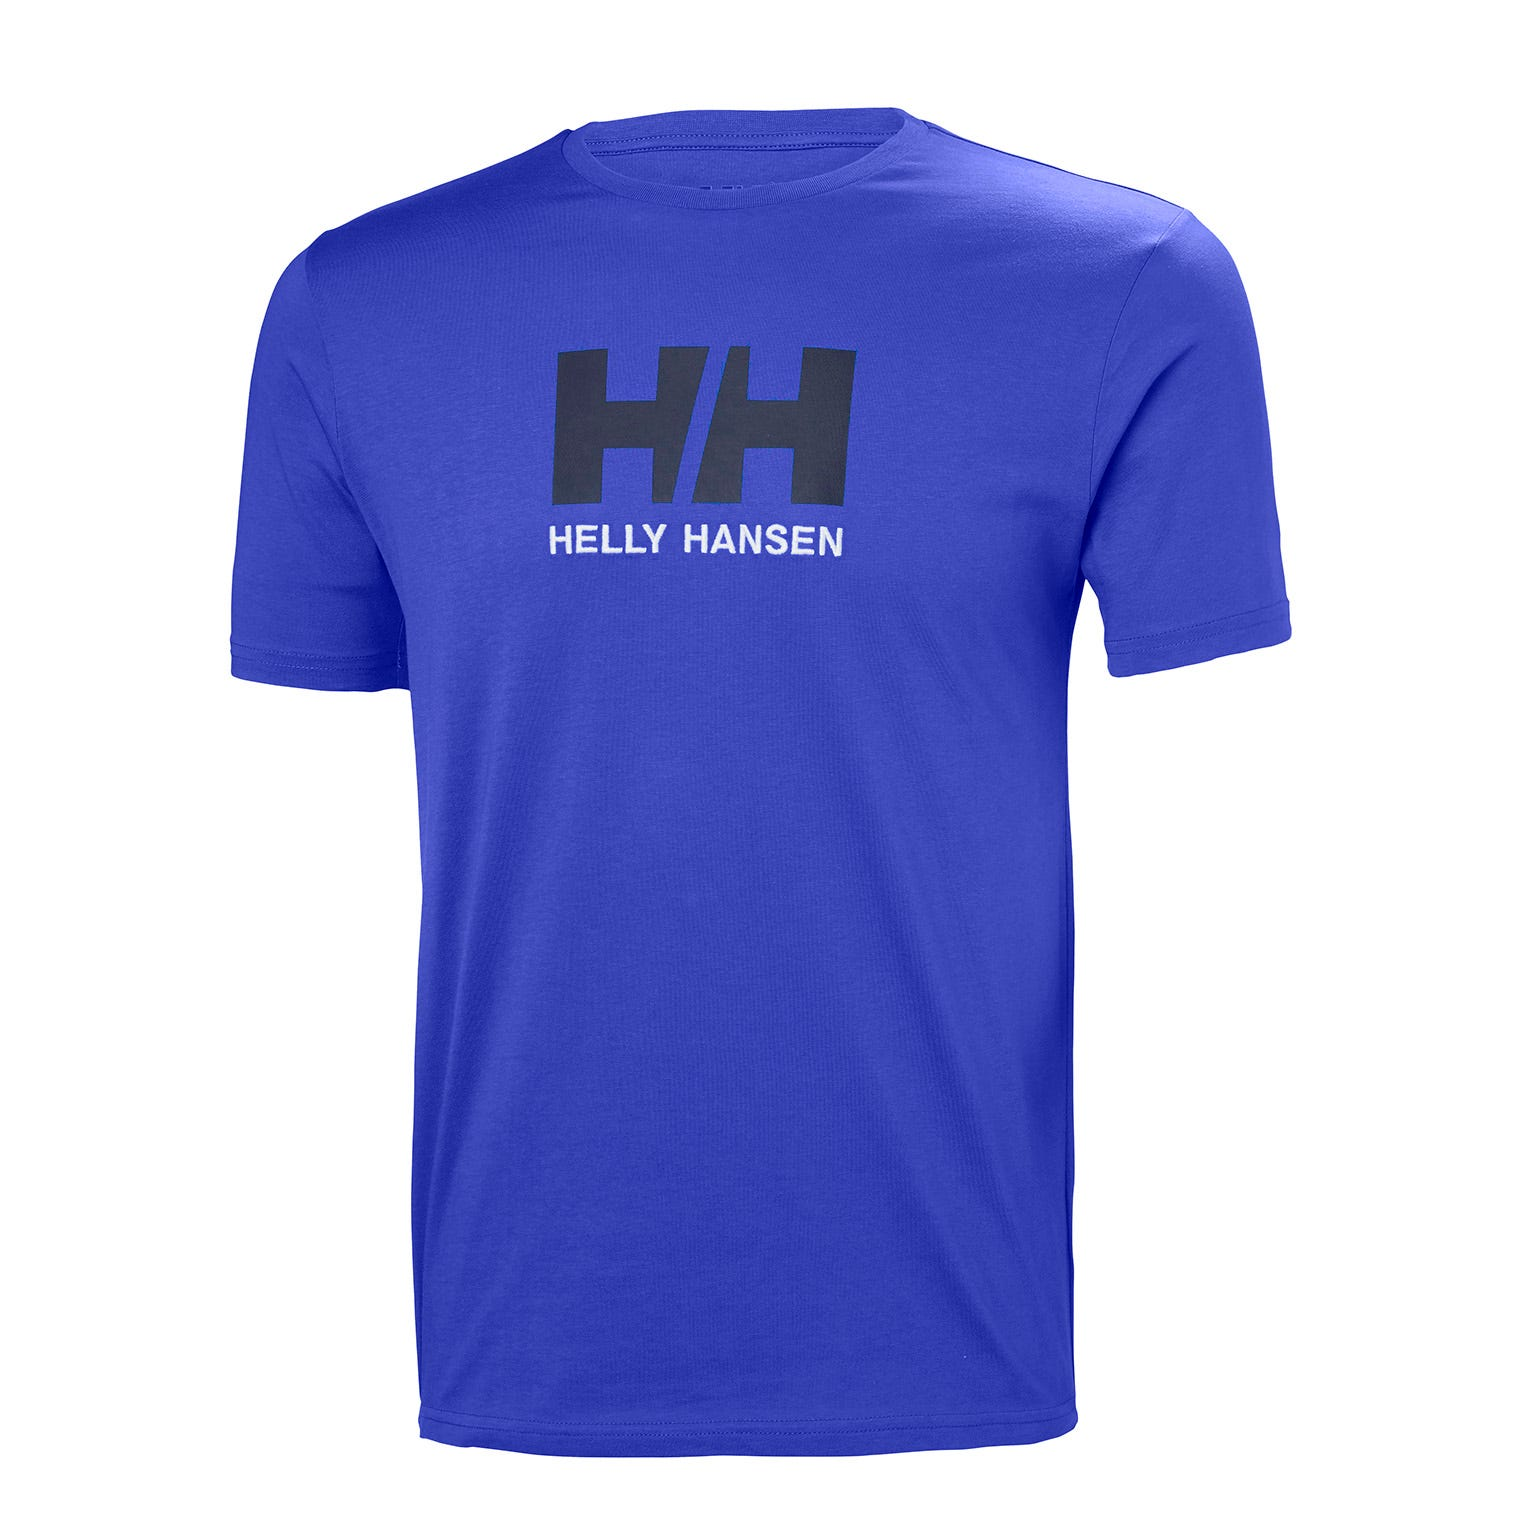 Helly Hansen Mens Hh Logo Tshirt Blue Xxxl